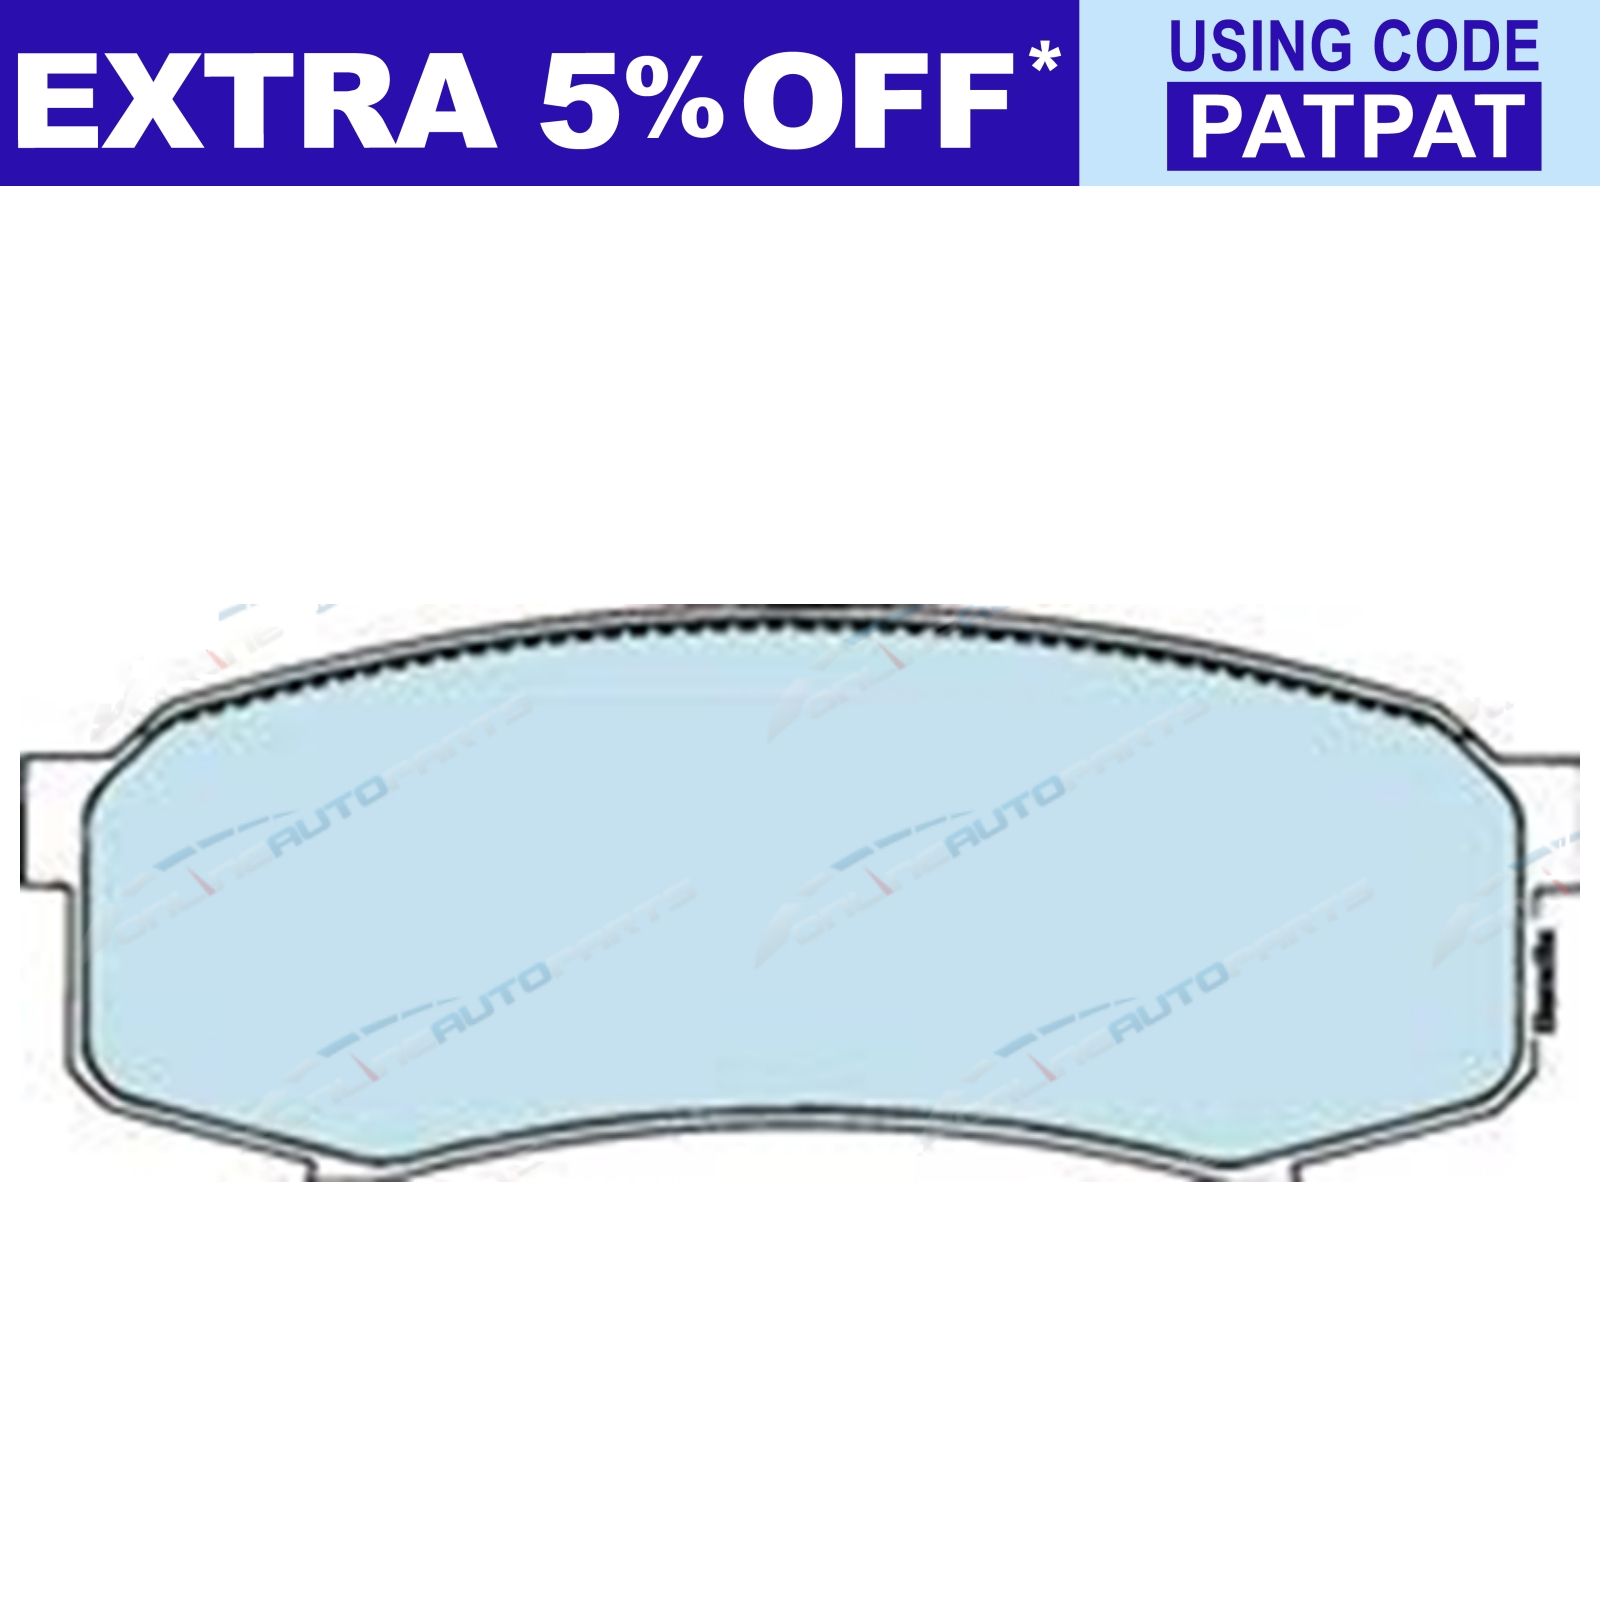 Rear-Disc-Brake-Pads-Bendix-suits-Landcruiser-75-78-79-Series-4x4-80-105-70 thumbnail 2